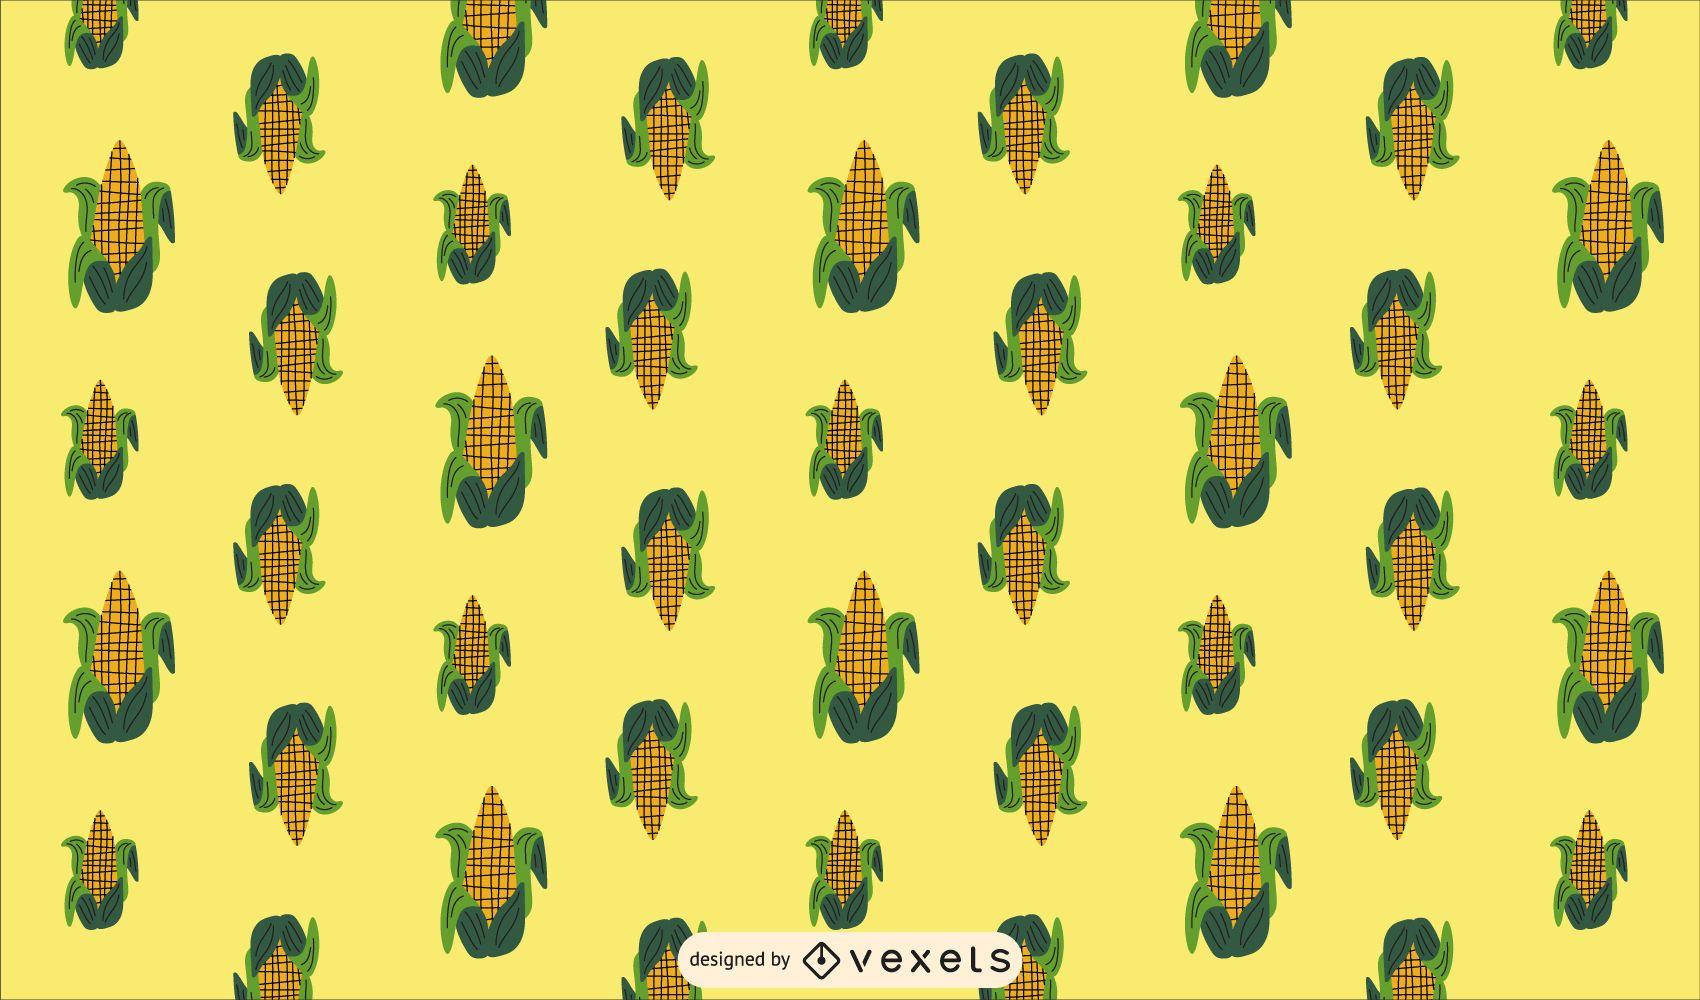 Diseño de patrón de maíz